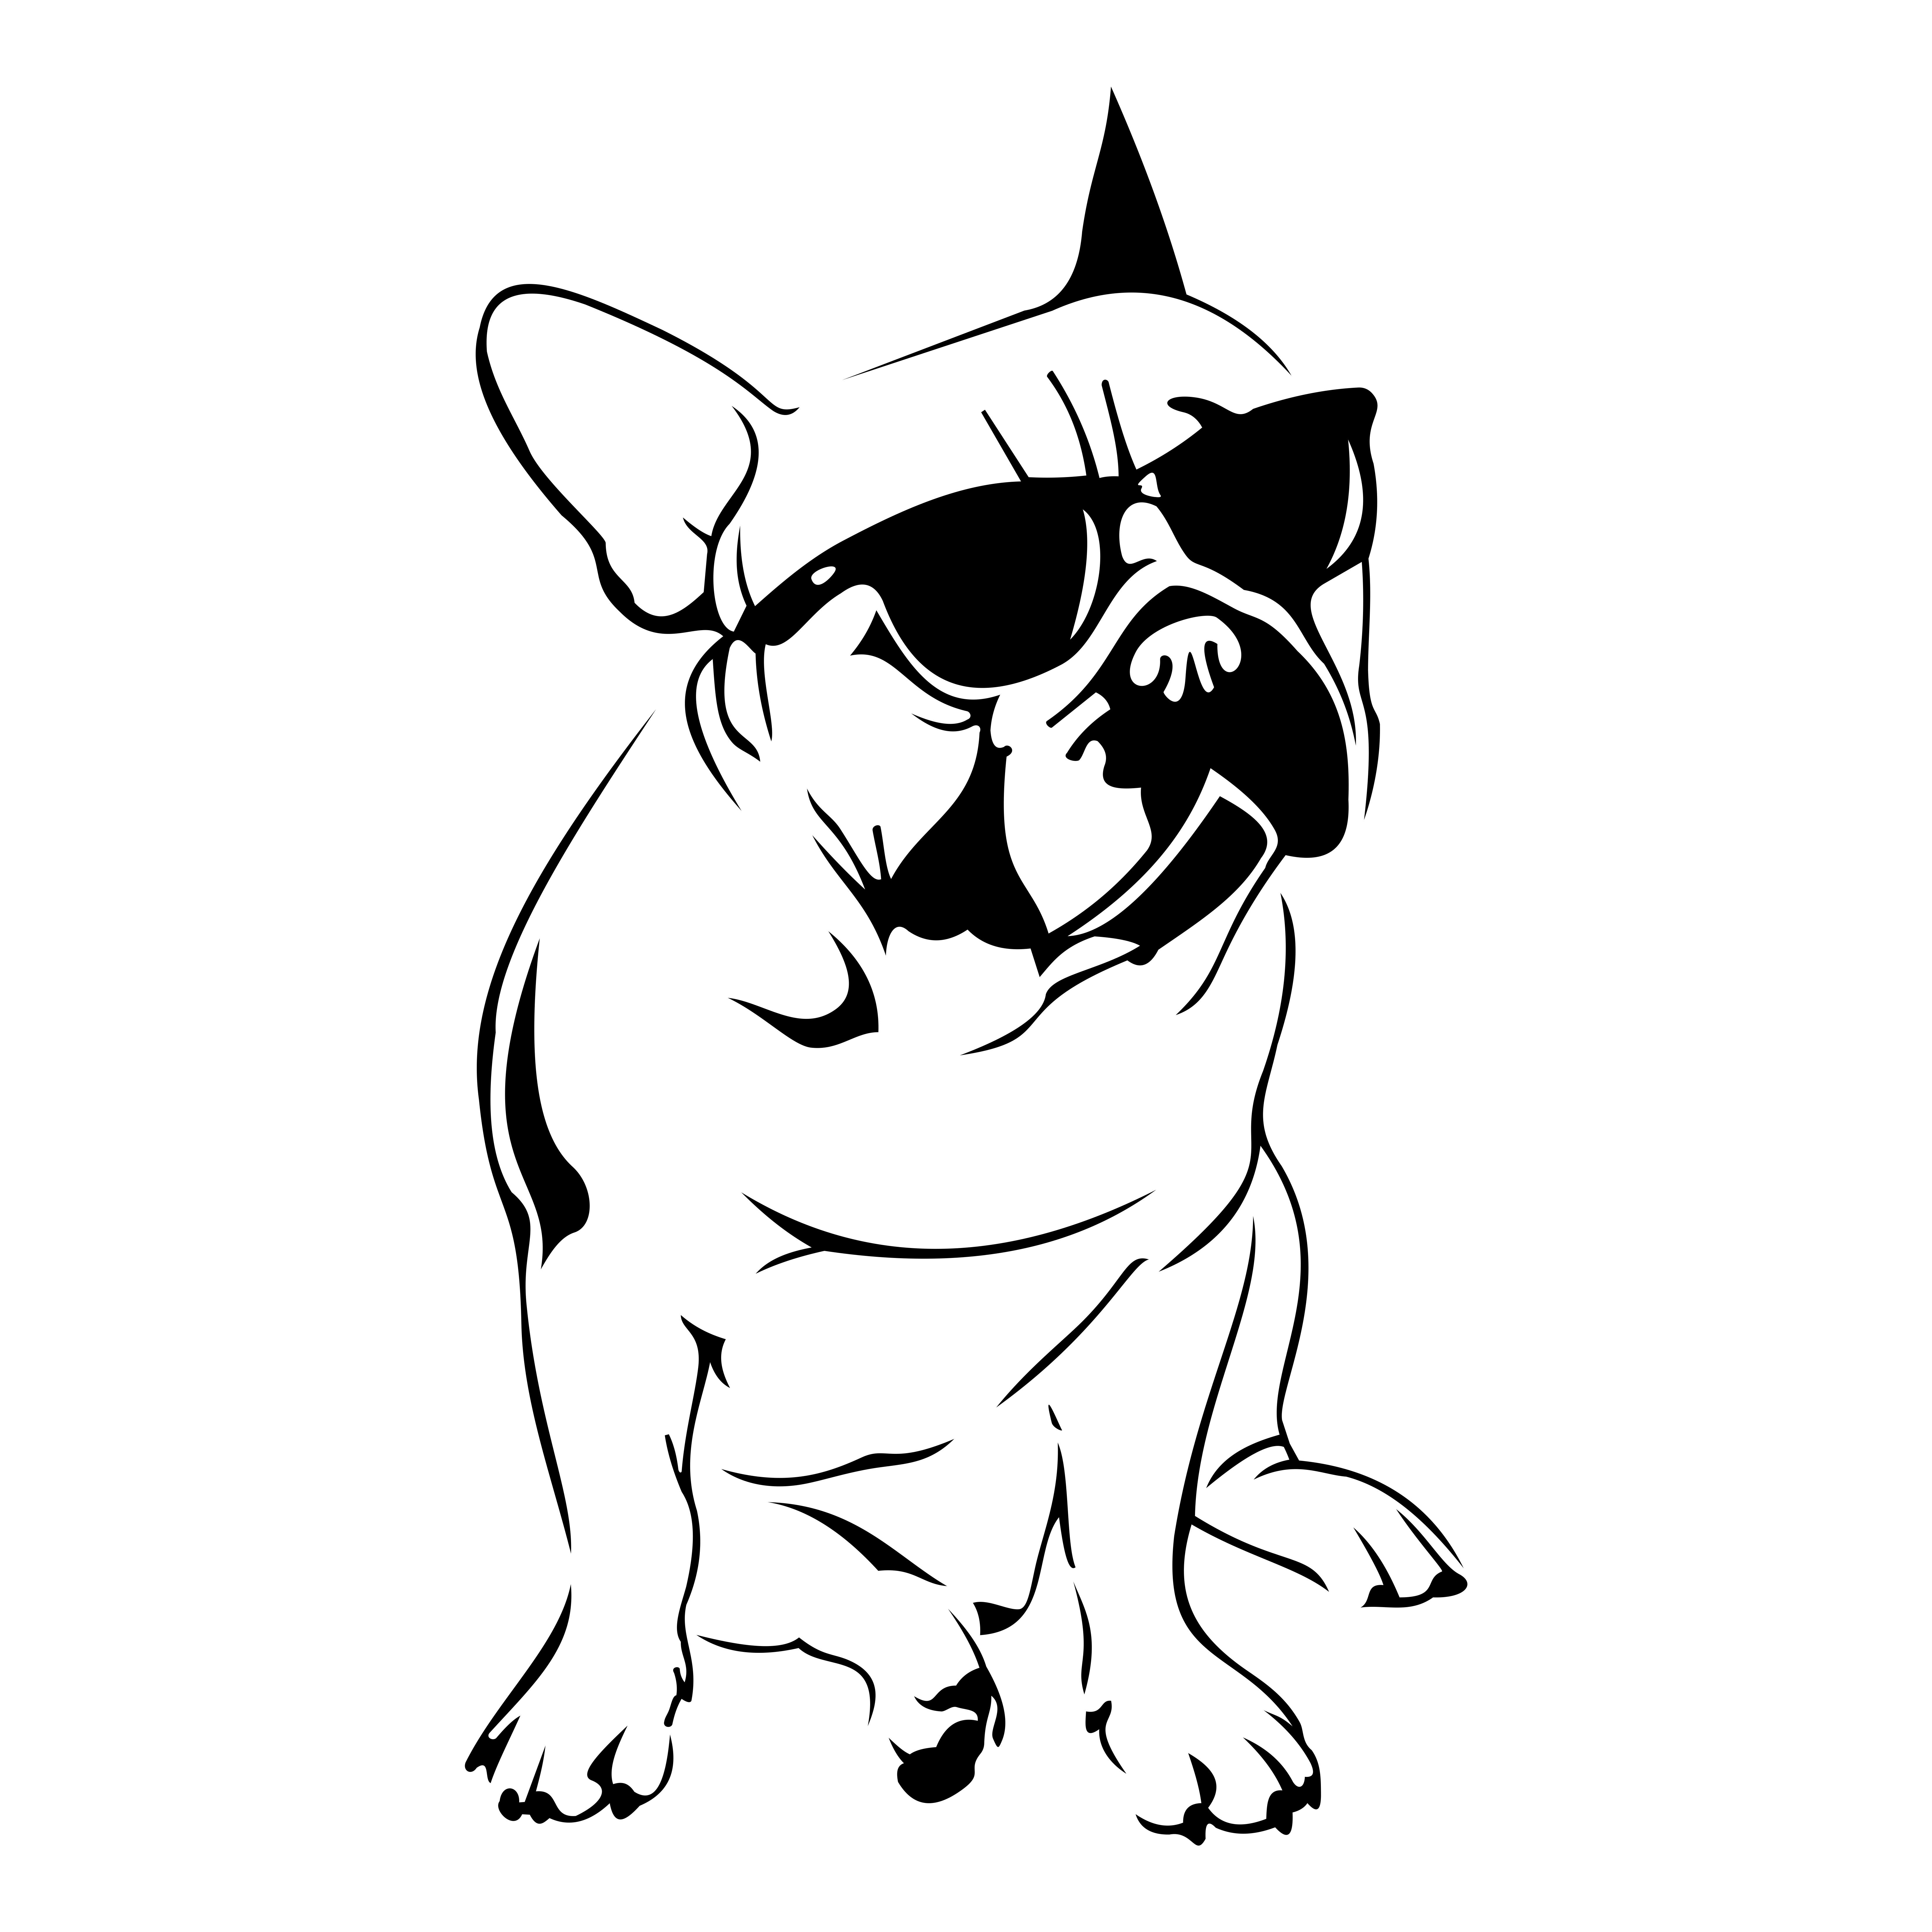 French Bulldog clipart #19 Bulldog Download French Bulldog